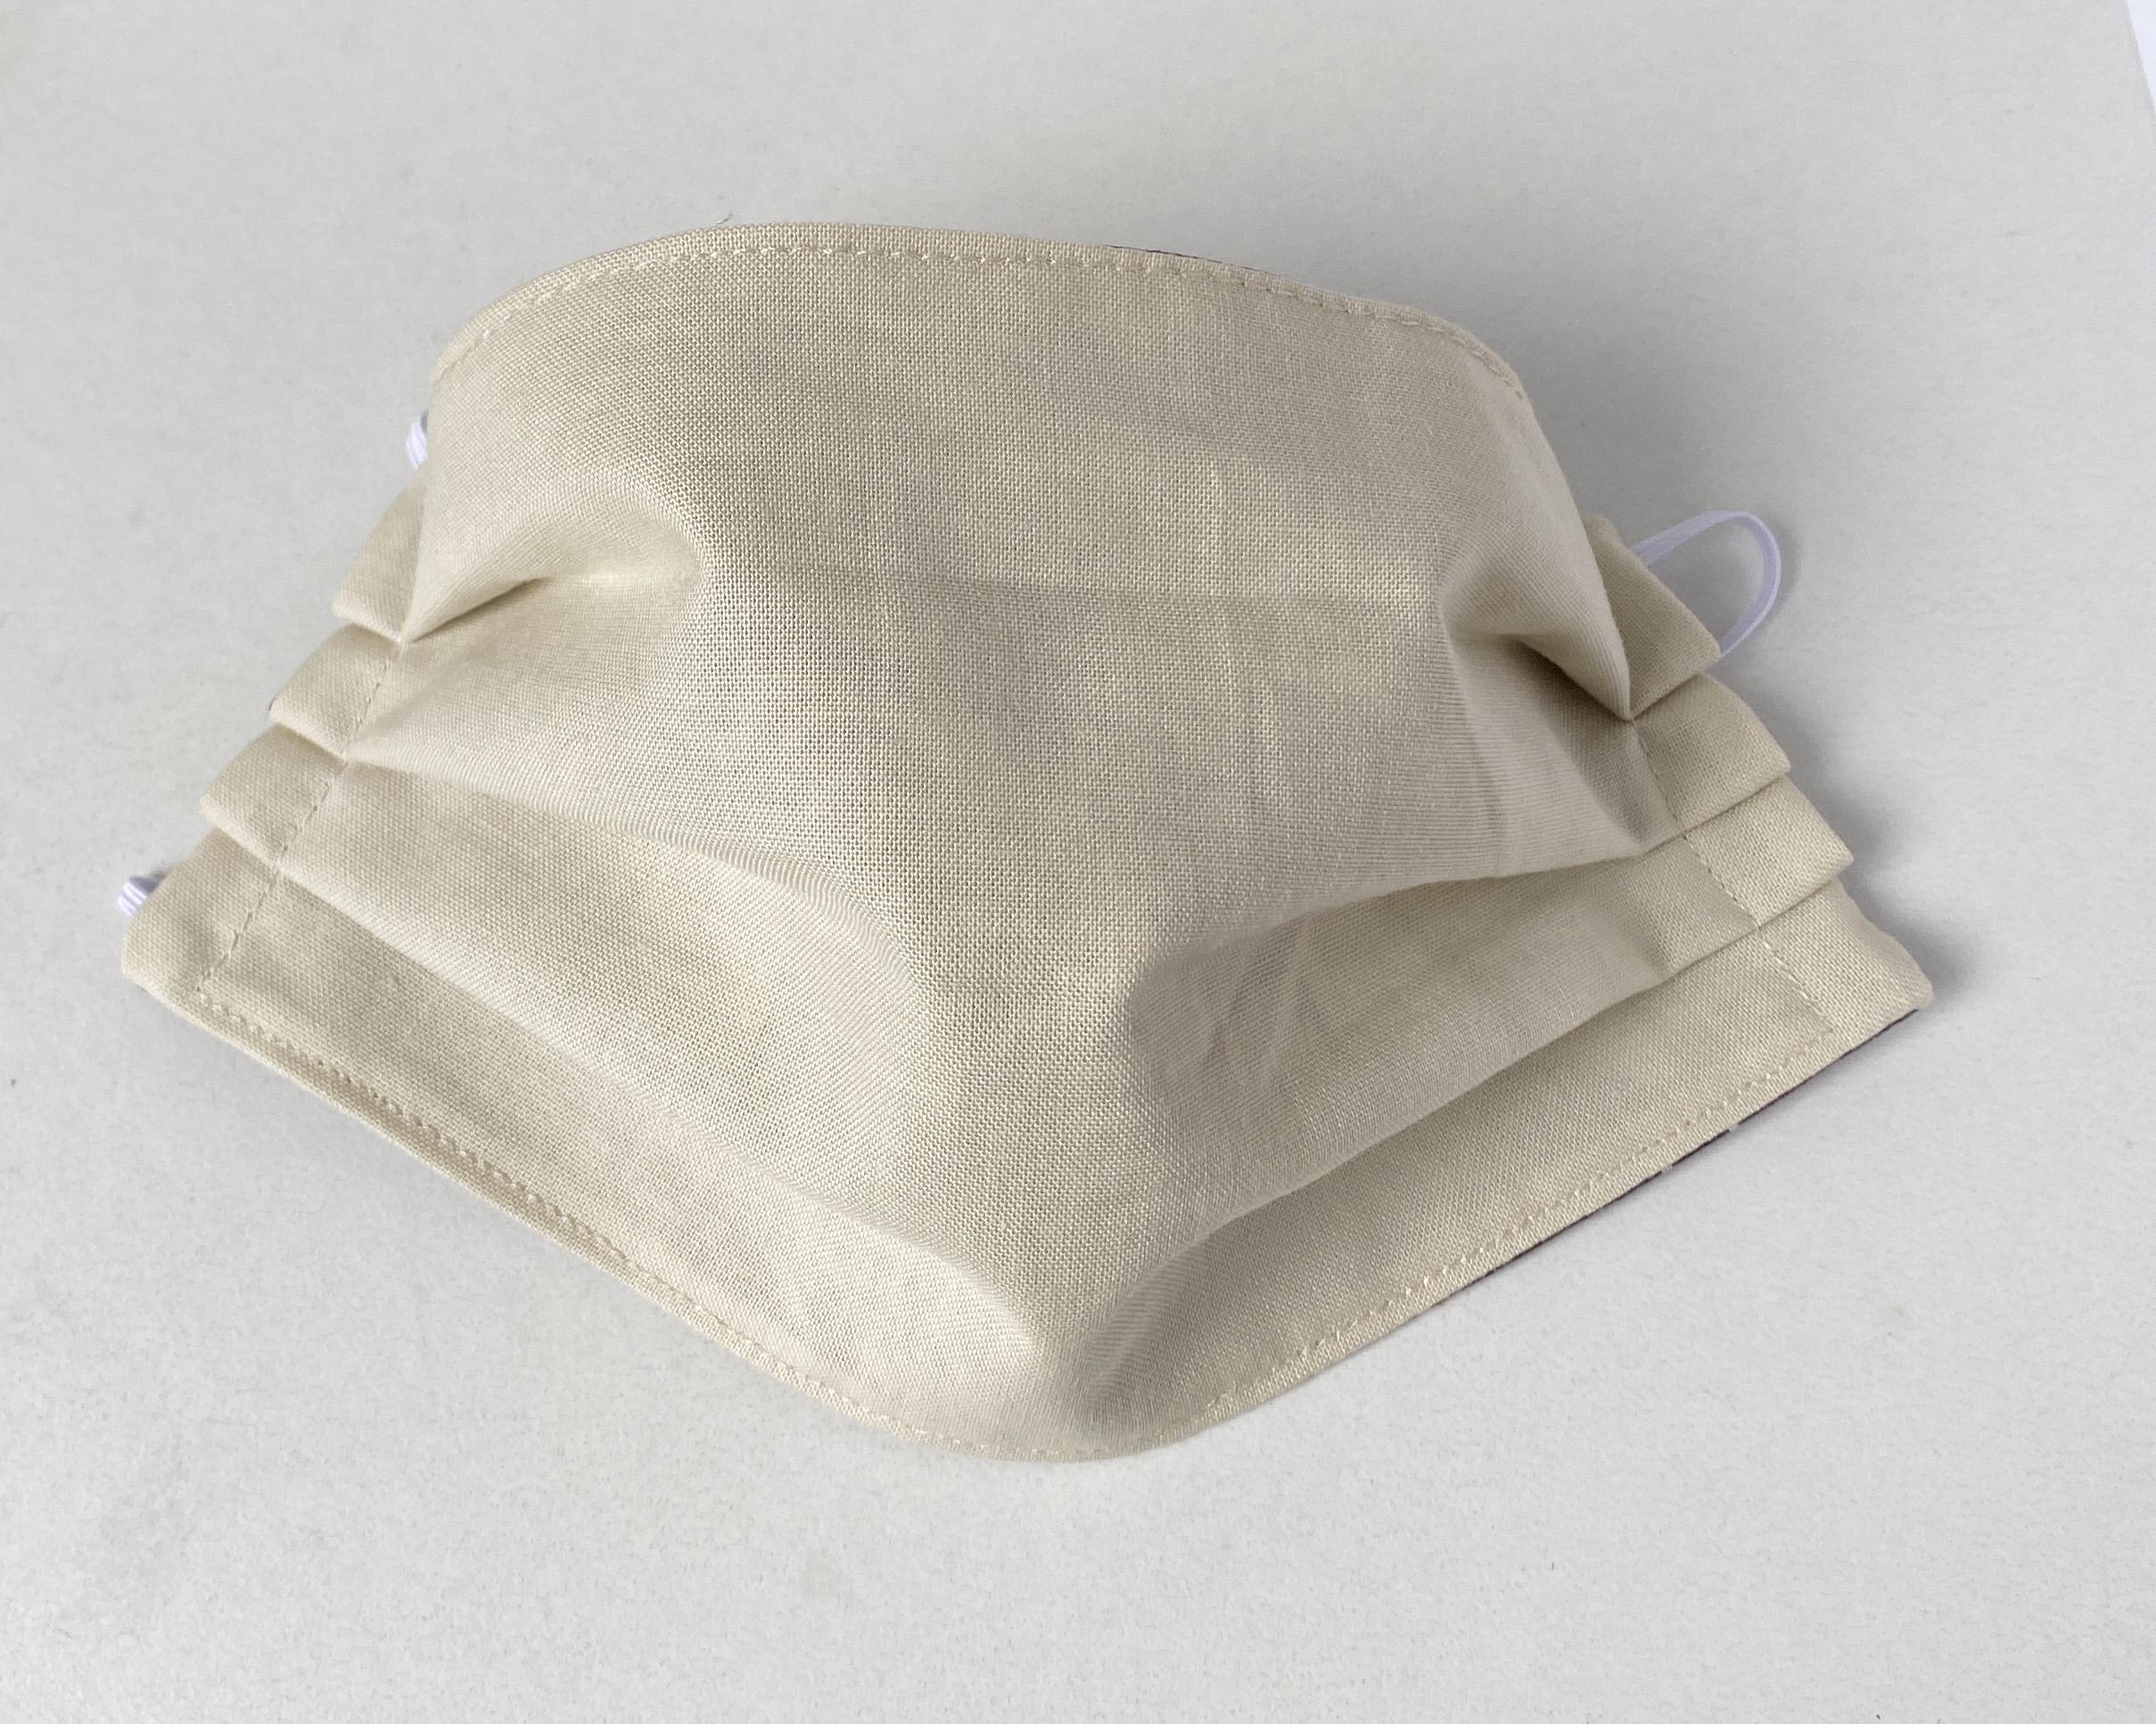 marimekko fabric face mask brown leaf Guada